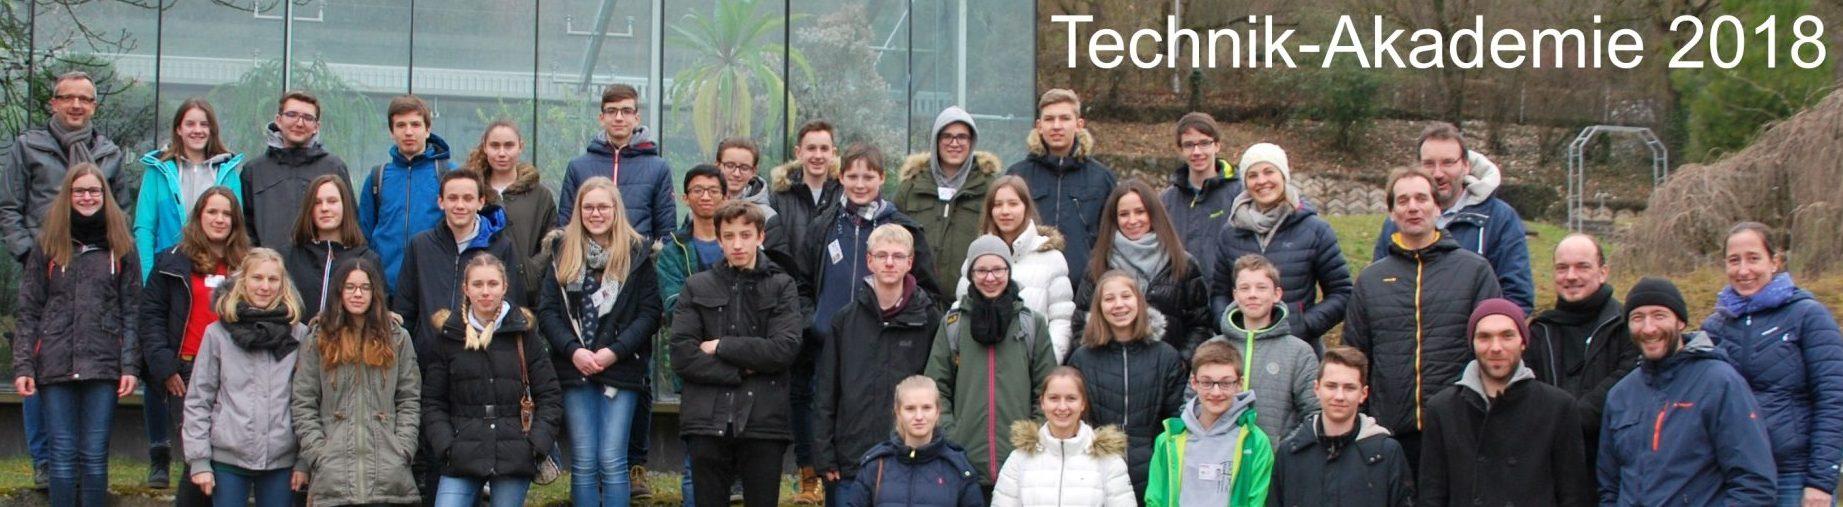 Technik-Akademie 2018